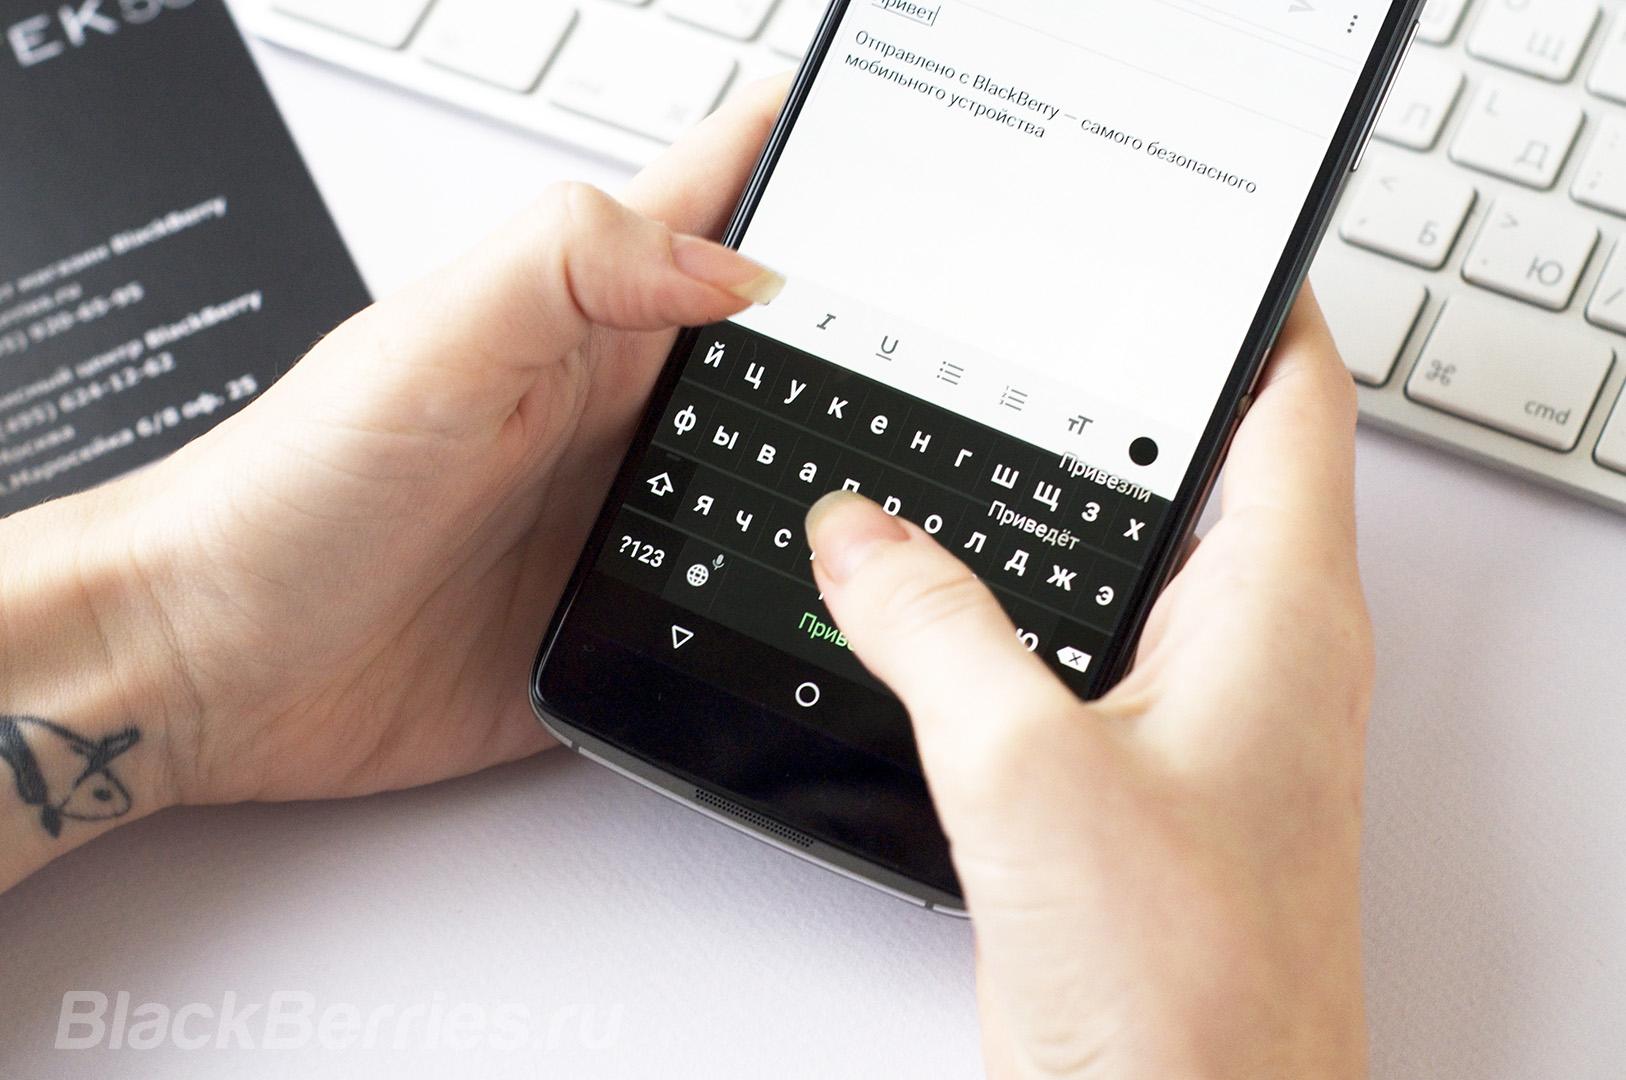 blackberry-dtek60-review-21